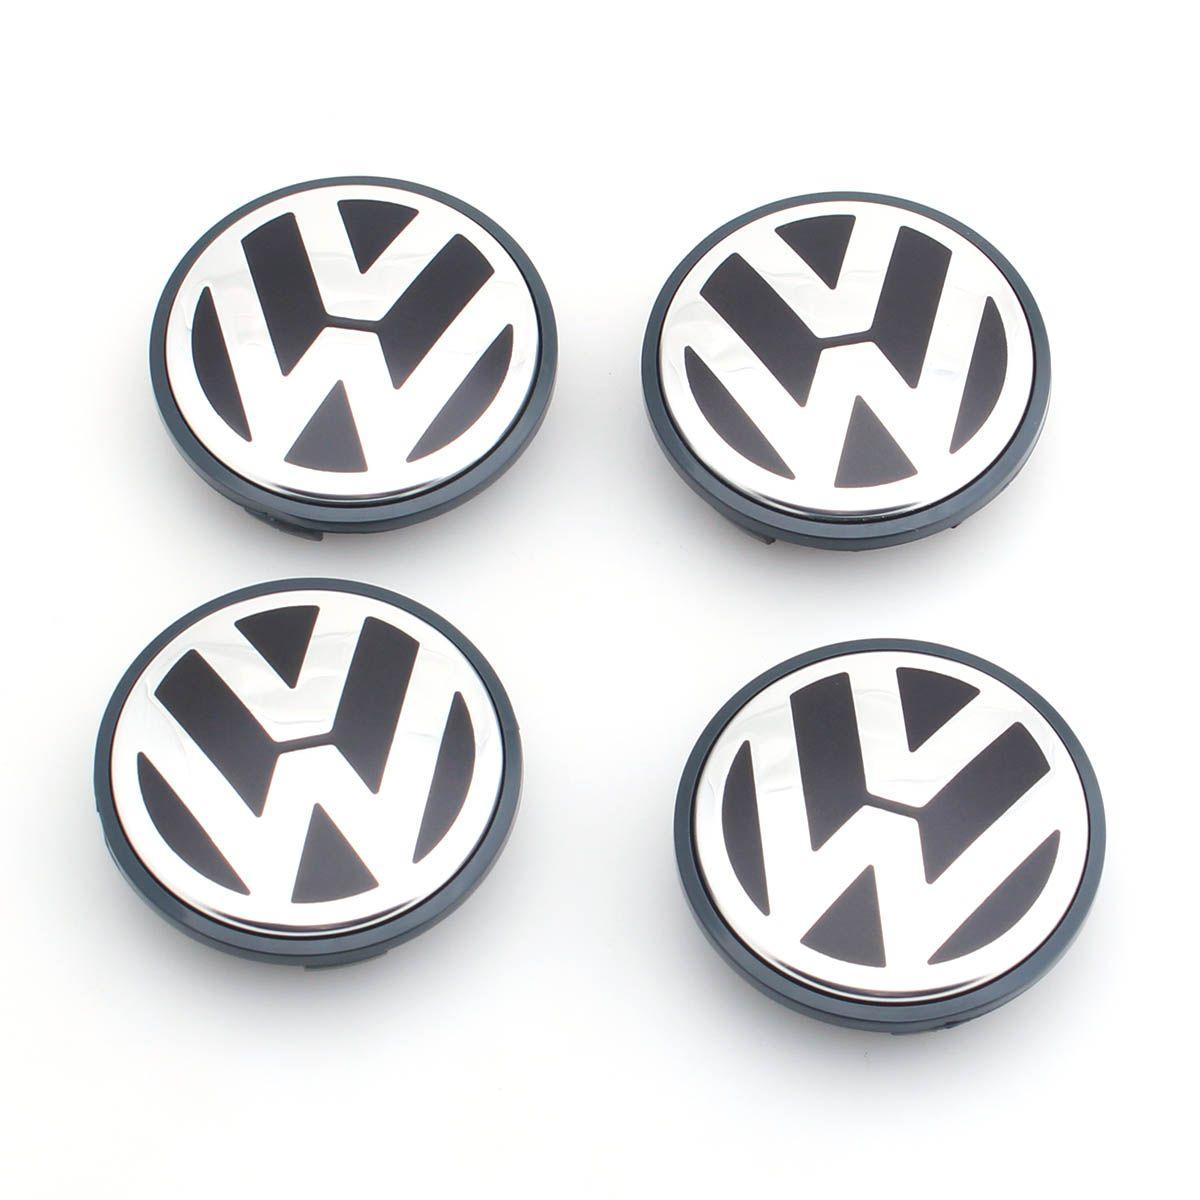 4pcs/set OEM 65mm Wheel Center Cap Logo Hub Cover Badge Emblem for VW Jetta MK5 Golf Passat